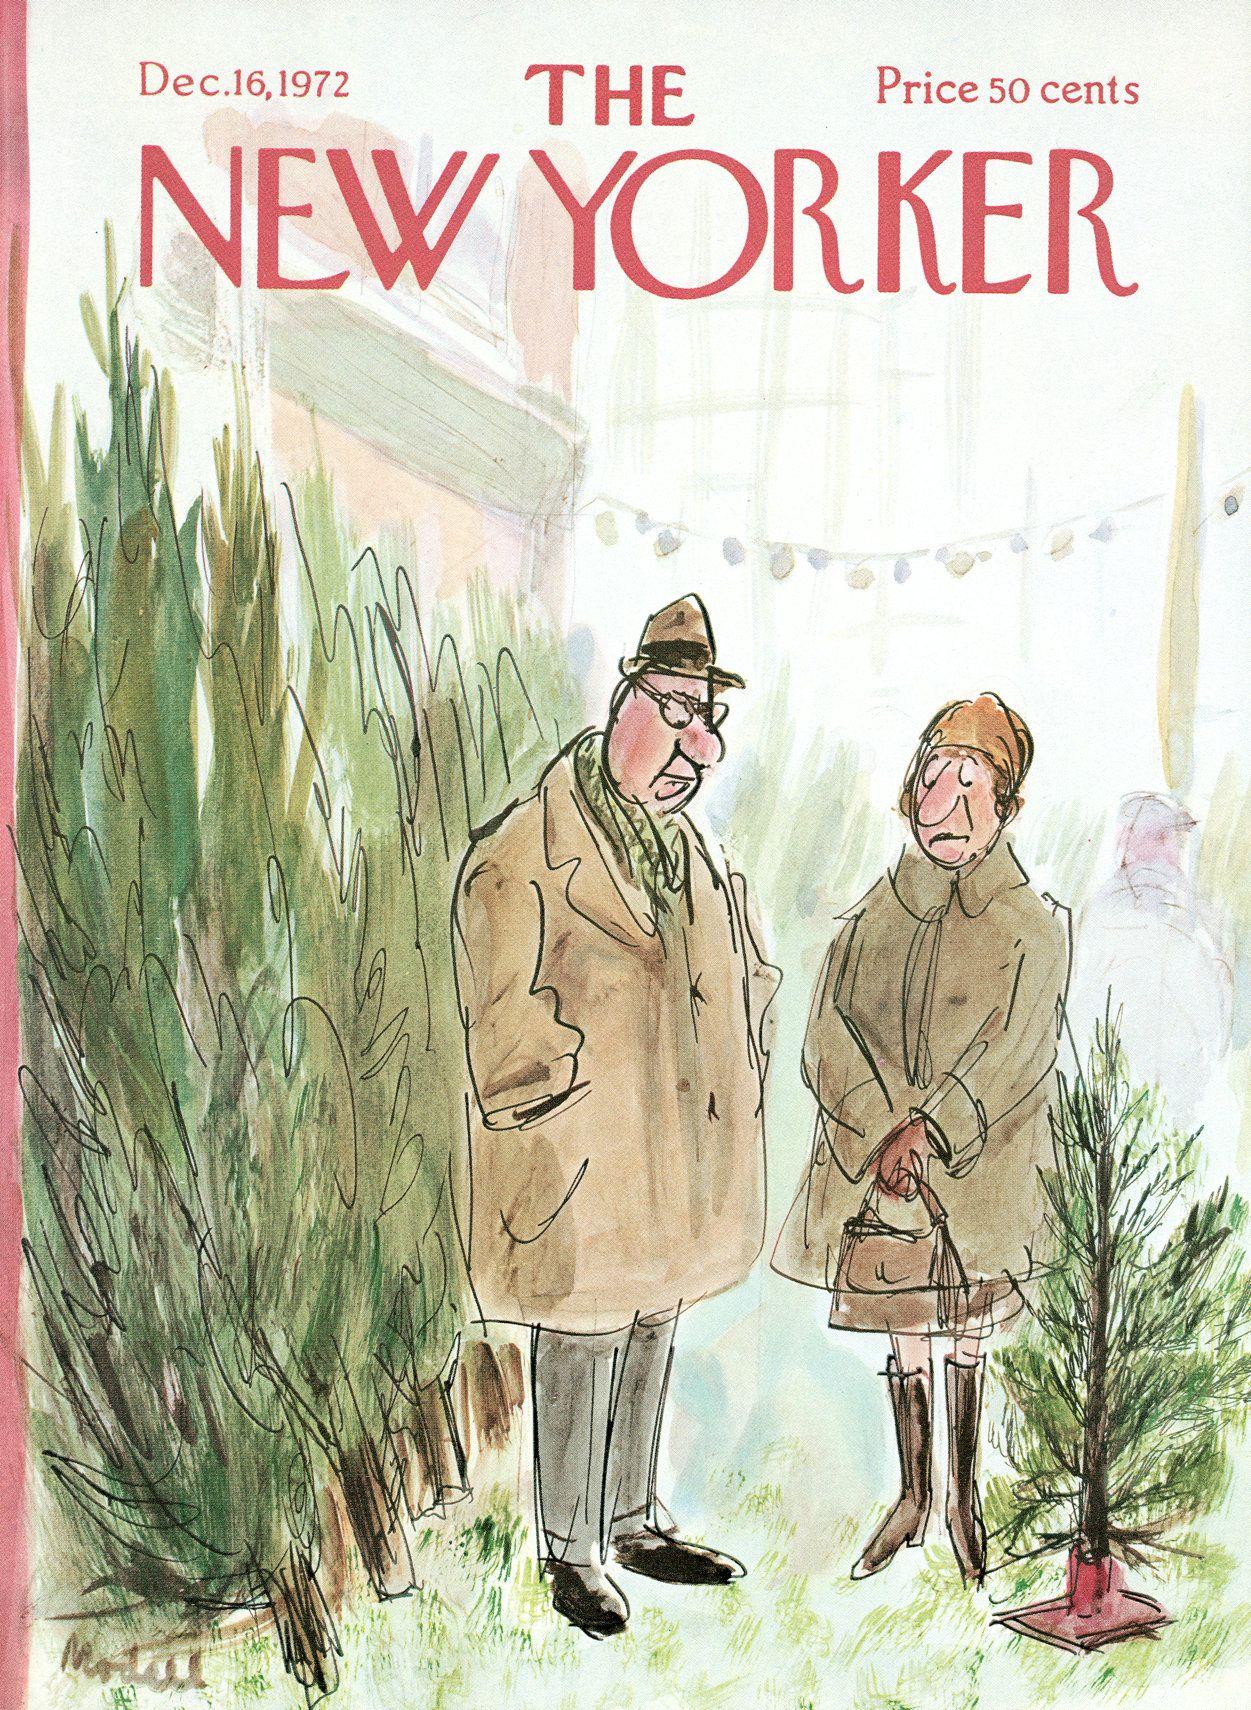 The New Yorker. Как мастурбировать в эпоху телекоммуникаций https://i.pinimg.com/originals/1a/40/17/1a40171fb004368d3bb3c20d969f9db8.jpg